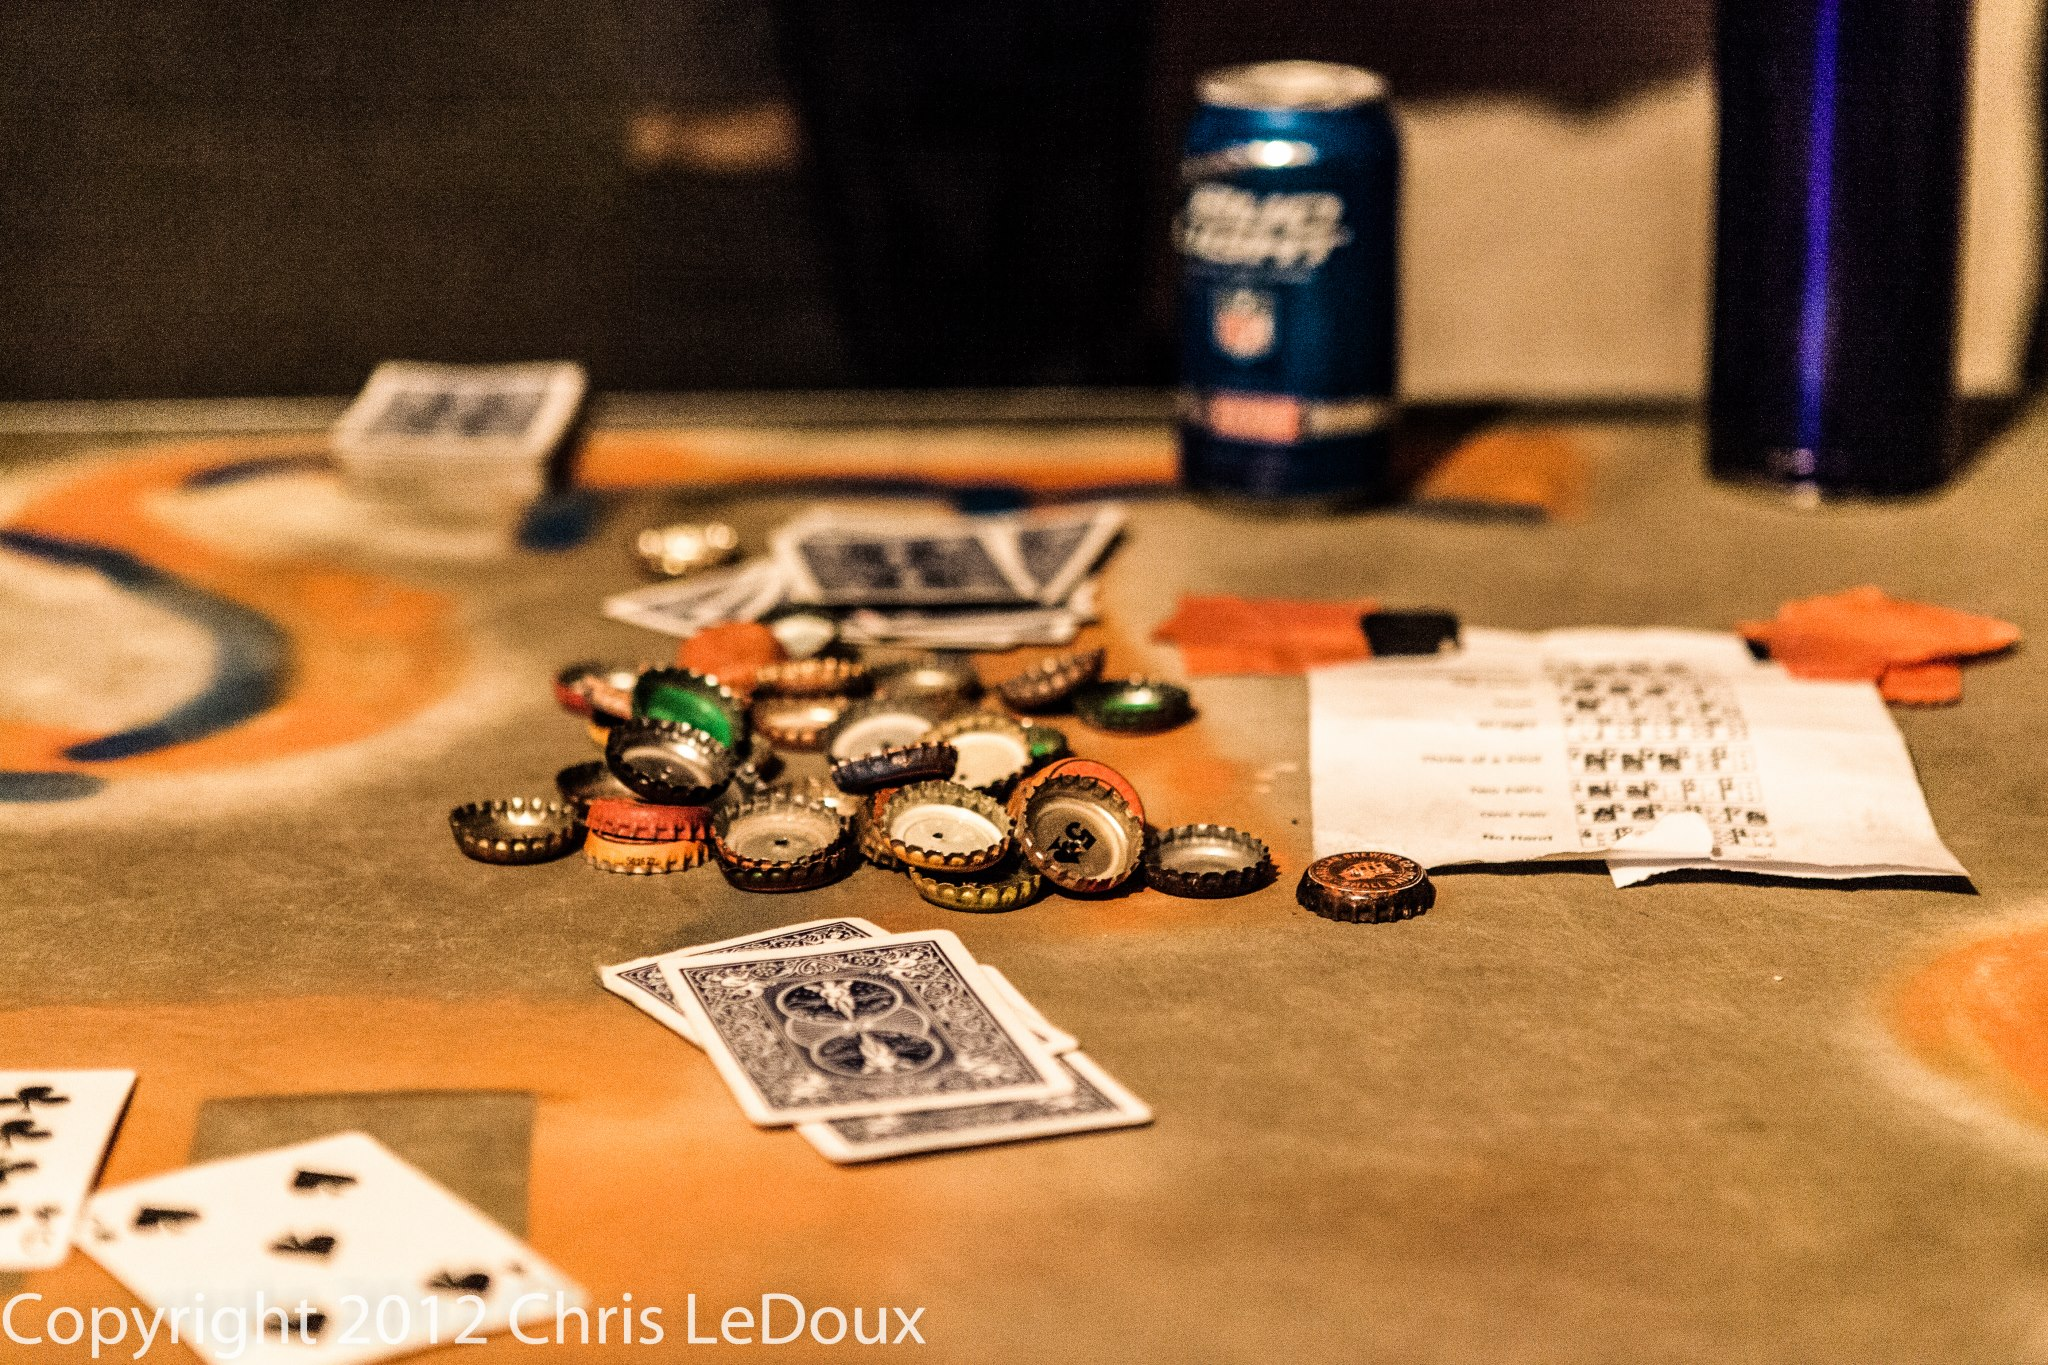 The last chance casino casino and gaming stocks